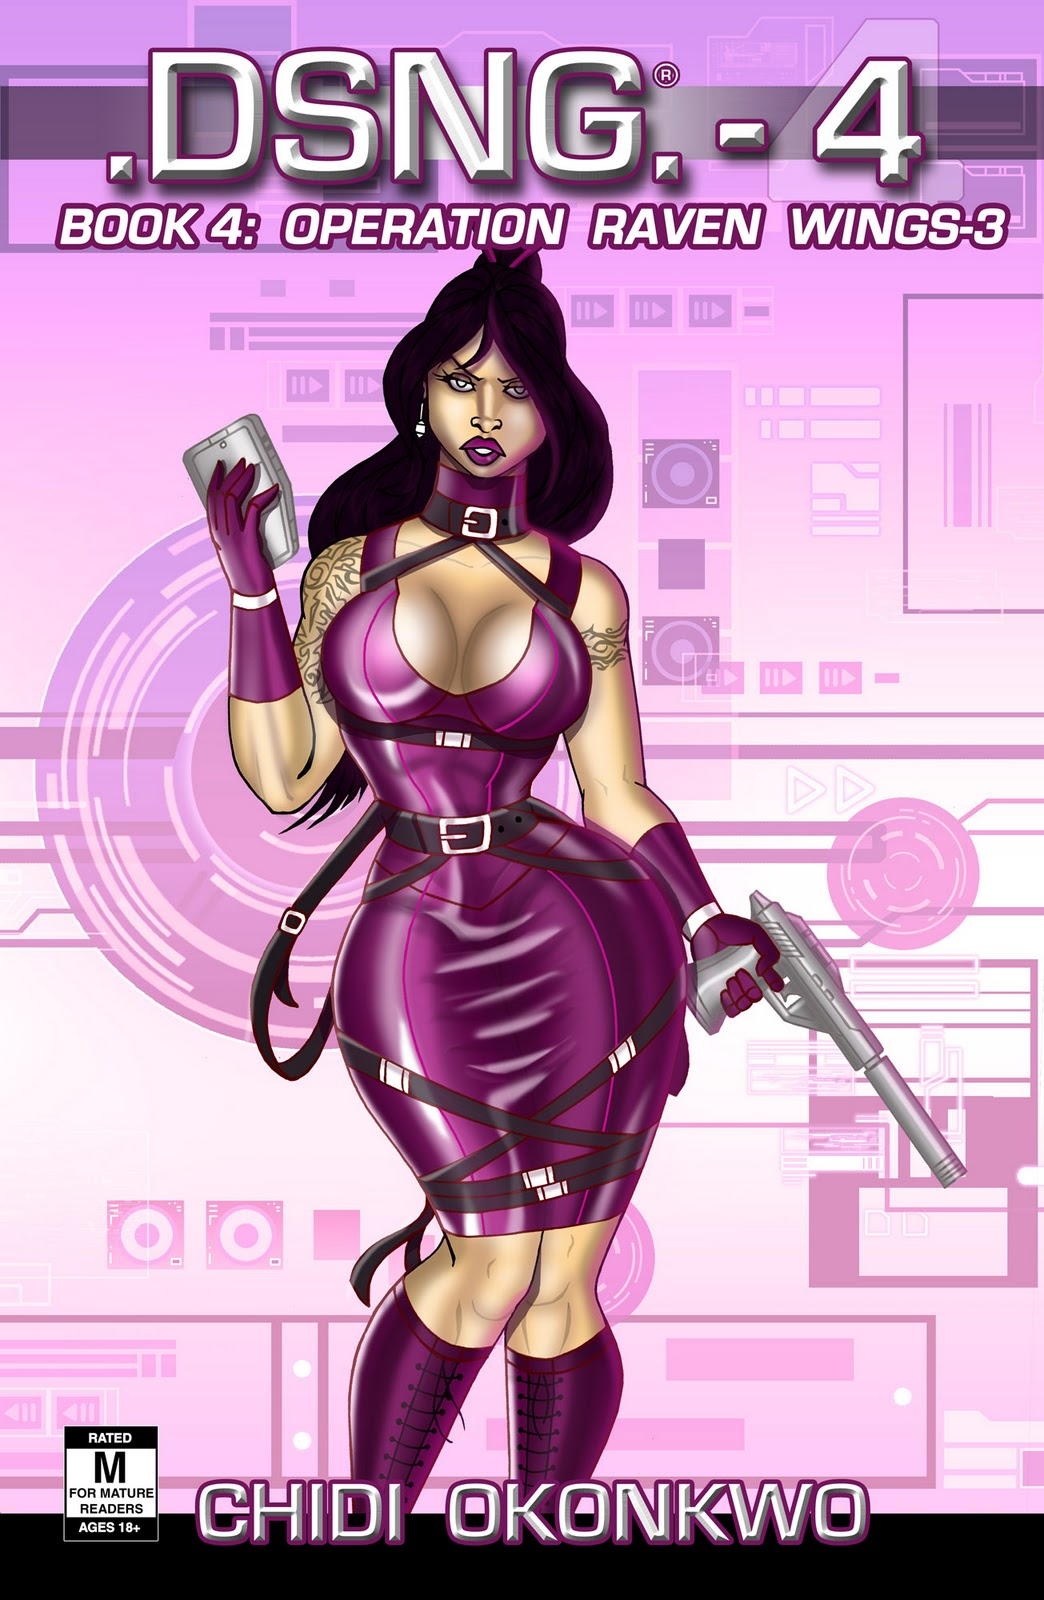 http://4.bp.blogspot.com/-8kAklPk3vUQ/Tppi2cHqzbI/AAAAAAAABjA/6mqrQrCzM8Y/s1600/DSNG+C4R5+EXTRA+BOOK+4+COVER+Chronicles+book+4+cover+sexy+busty+boobs+hips+glamor+pinup+handgun+silencer+PCD+yatalia+yentoshima.jpg